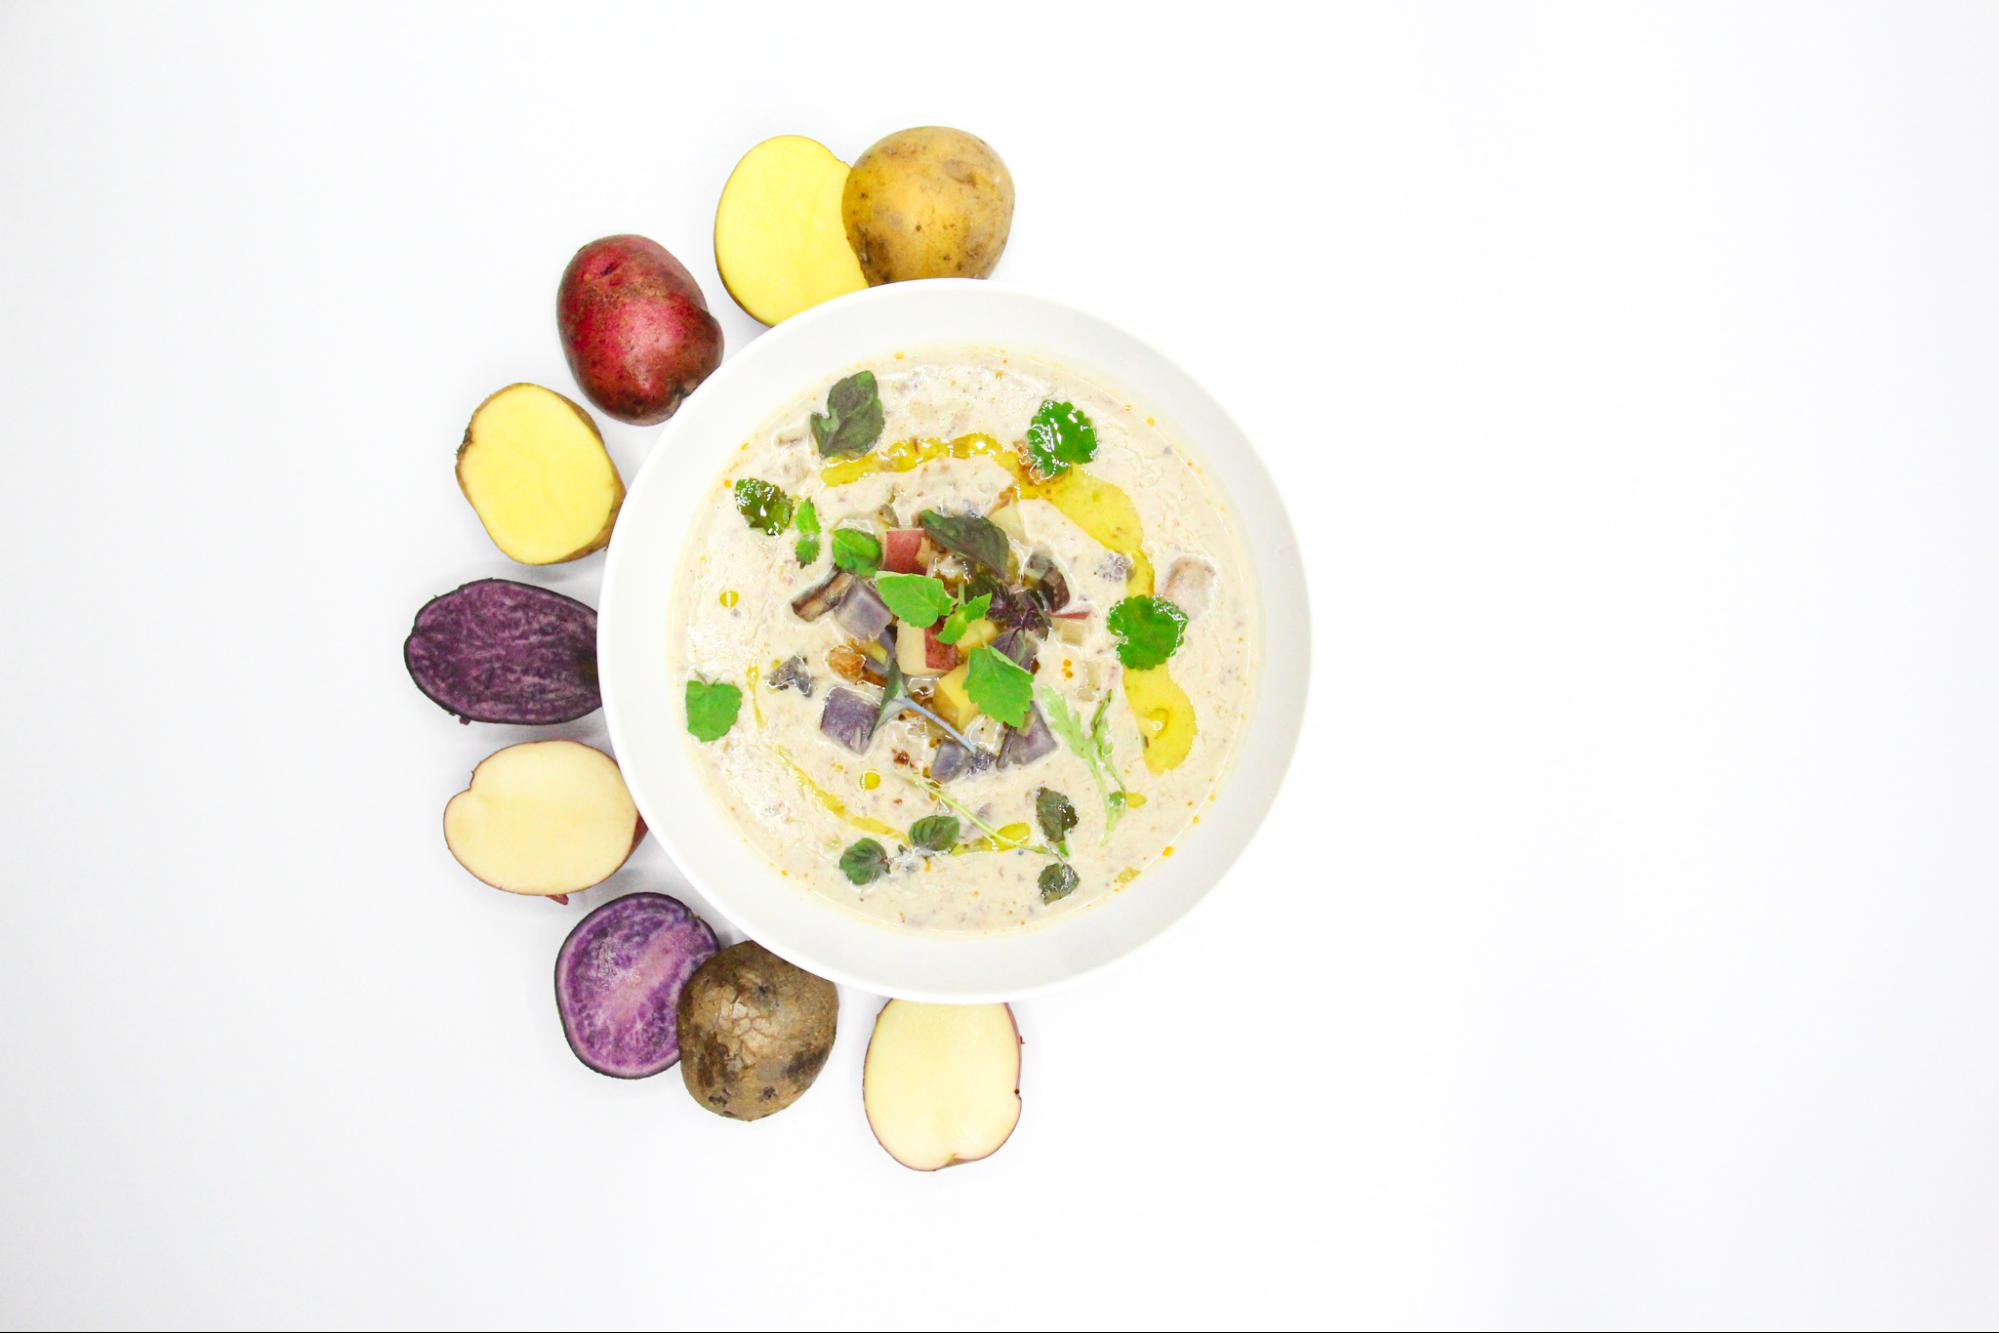 Dish 1:  Creamy potato soup, crispy potato crumble, micro greens, extra virgin olive oil